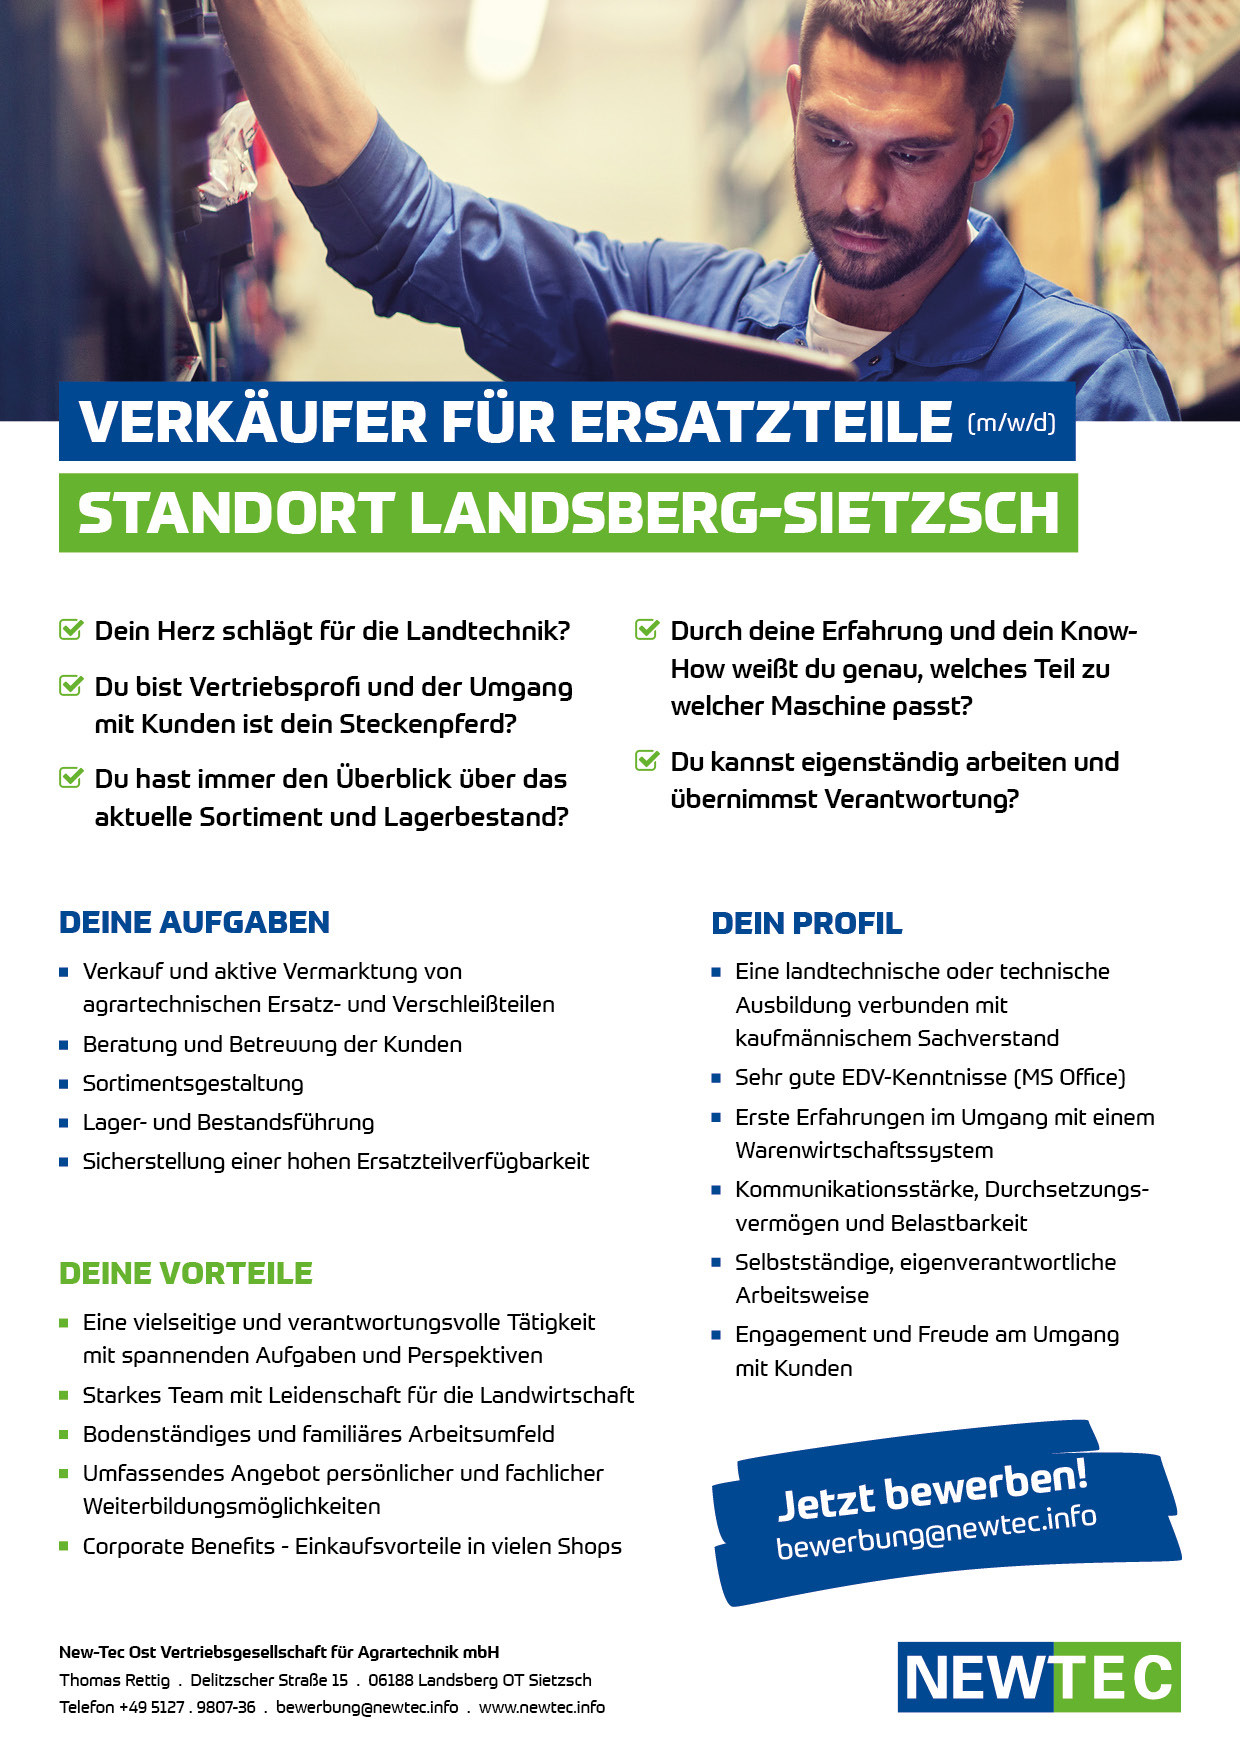 NEWTEC_Stellenanzeige_Verkaeufer-fuer-Ersatzteile_Landsberg-Sietzsch